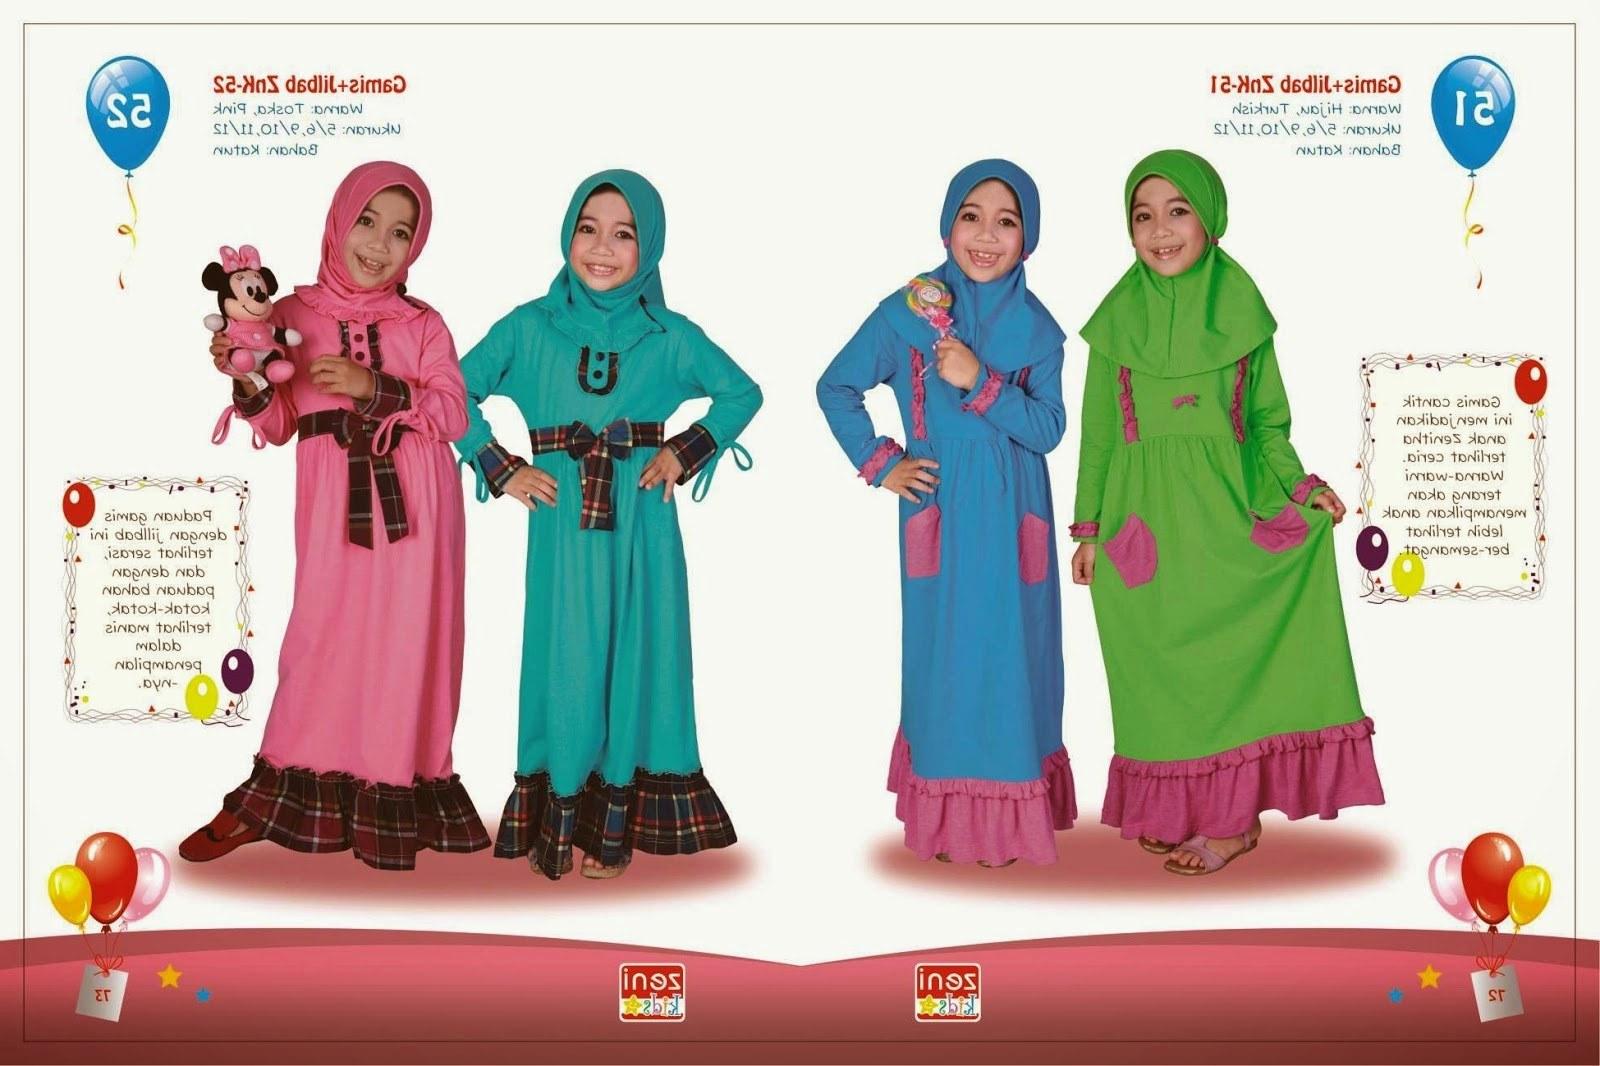 Model Gambar Baju Lebaran Lucu Kvdd Baju Lebaran Anak Setelan Gamis Yang Imut Dan Lucu 2015